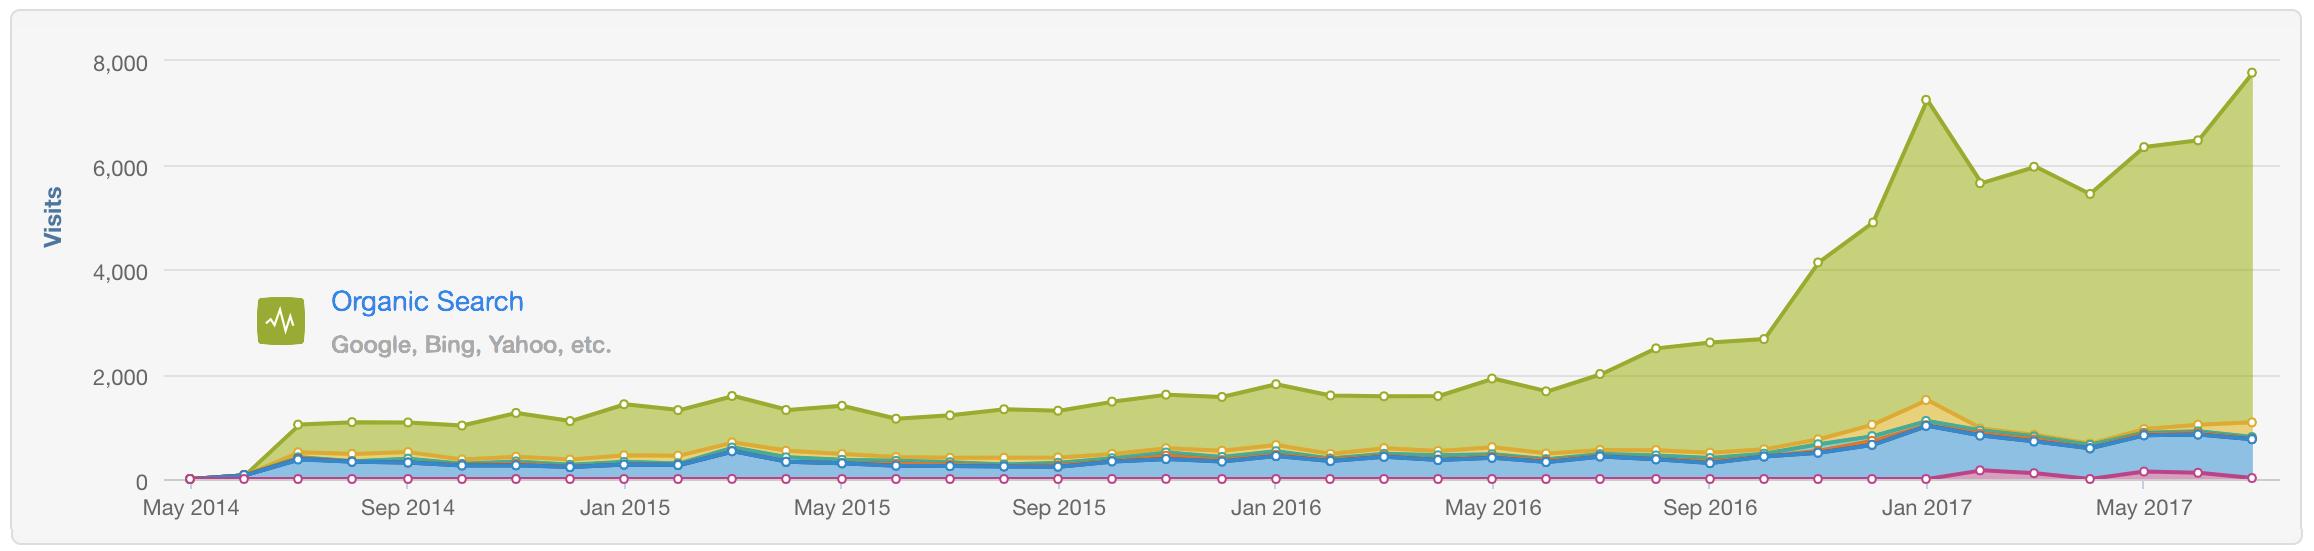 seo-search-engine-optimization-growth-inbund-marketing